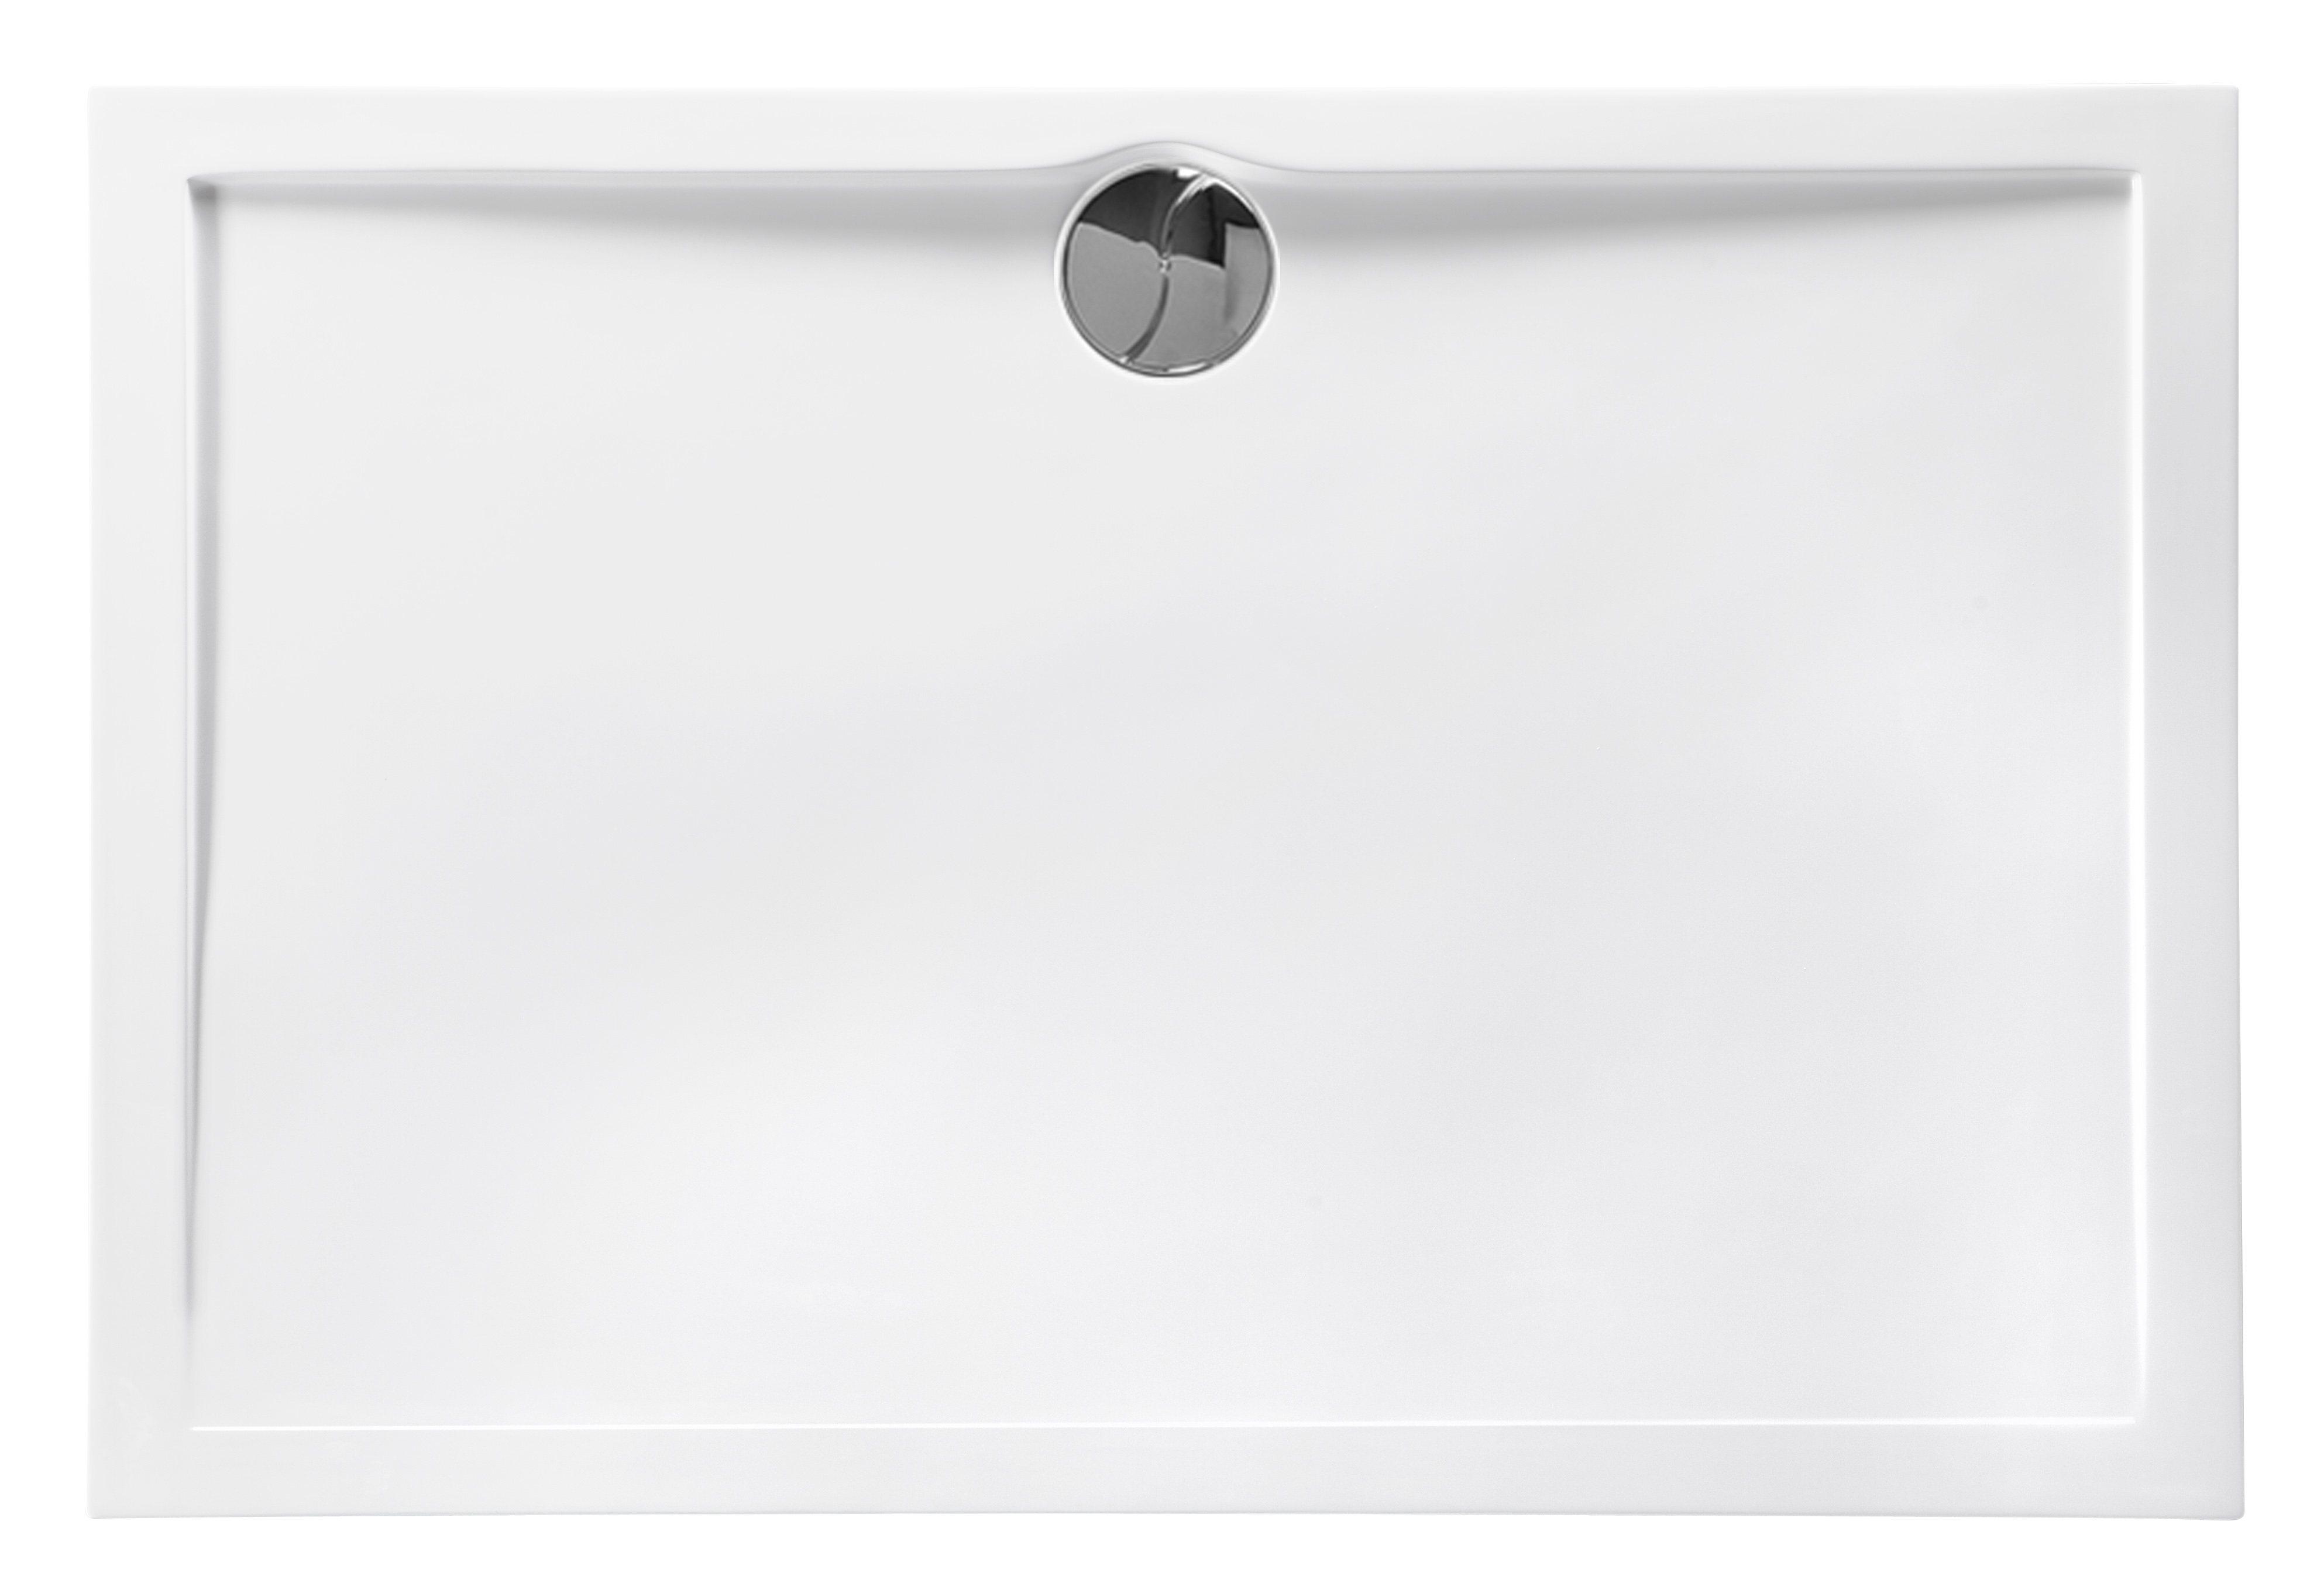 receveur rectangulaire prefixe receveur rectangle aquarine. Black Bedroom Furniture Sets. Home Design Ideas